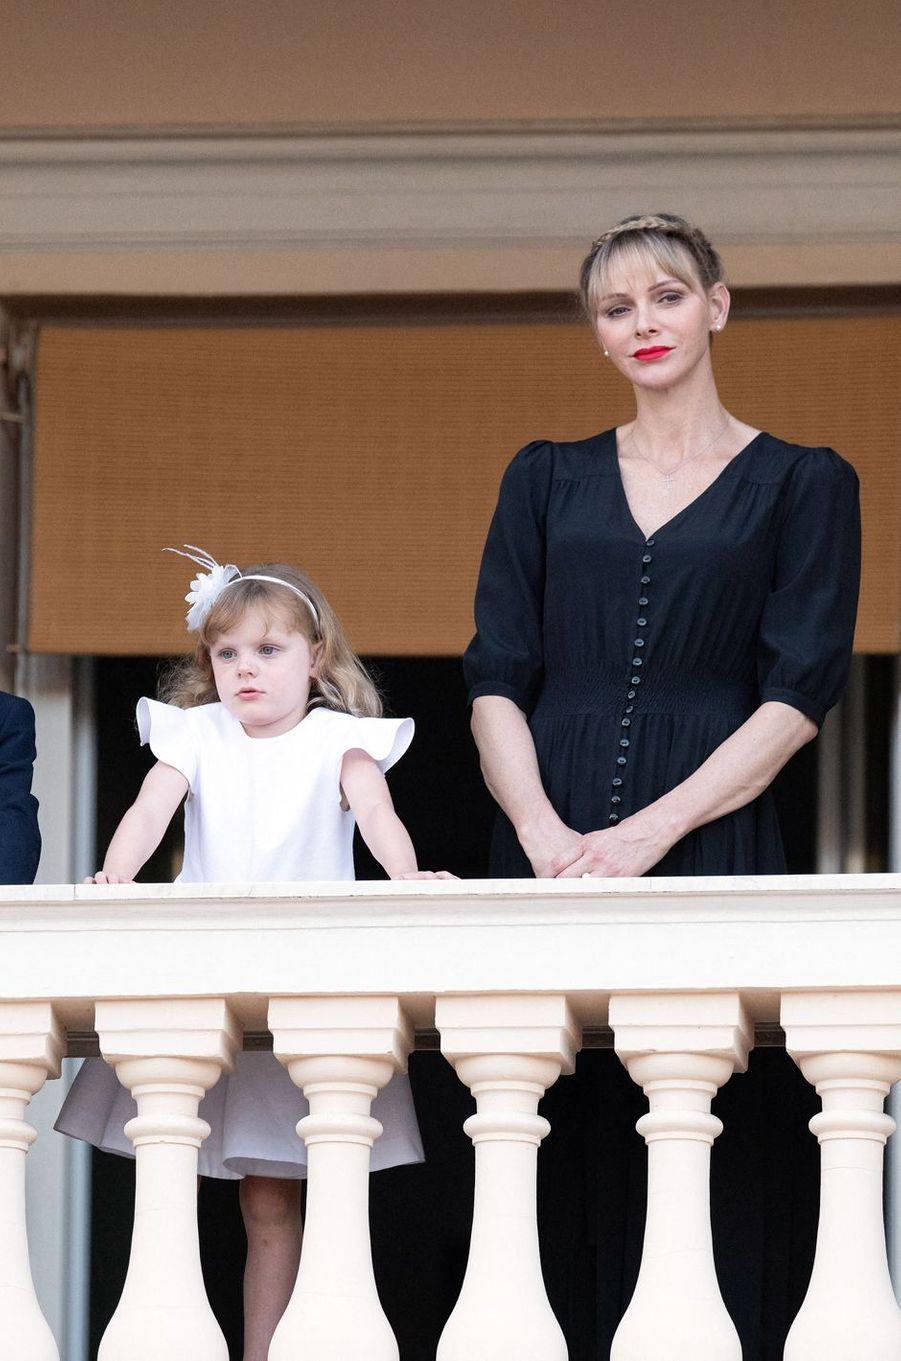 La princesse Charlène de Monaco avec sa fille la princesse Gabriella à Monaco, le 23 juin 2020